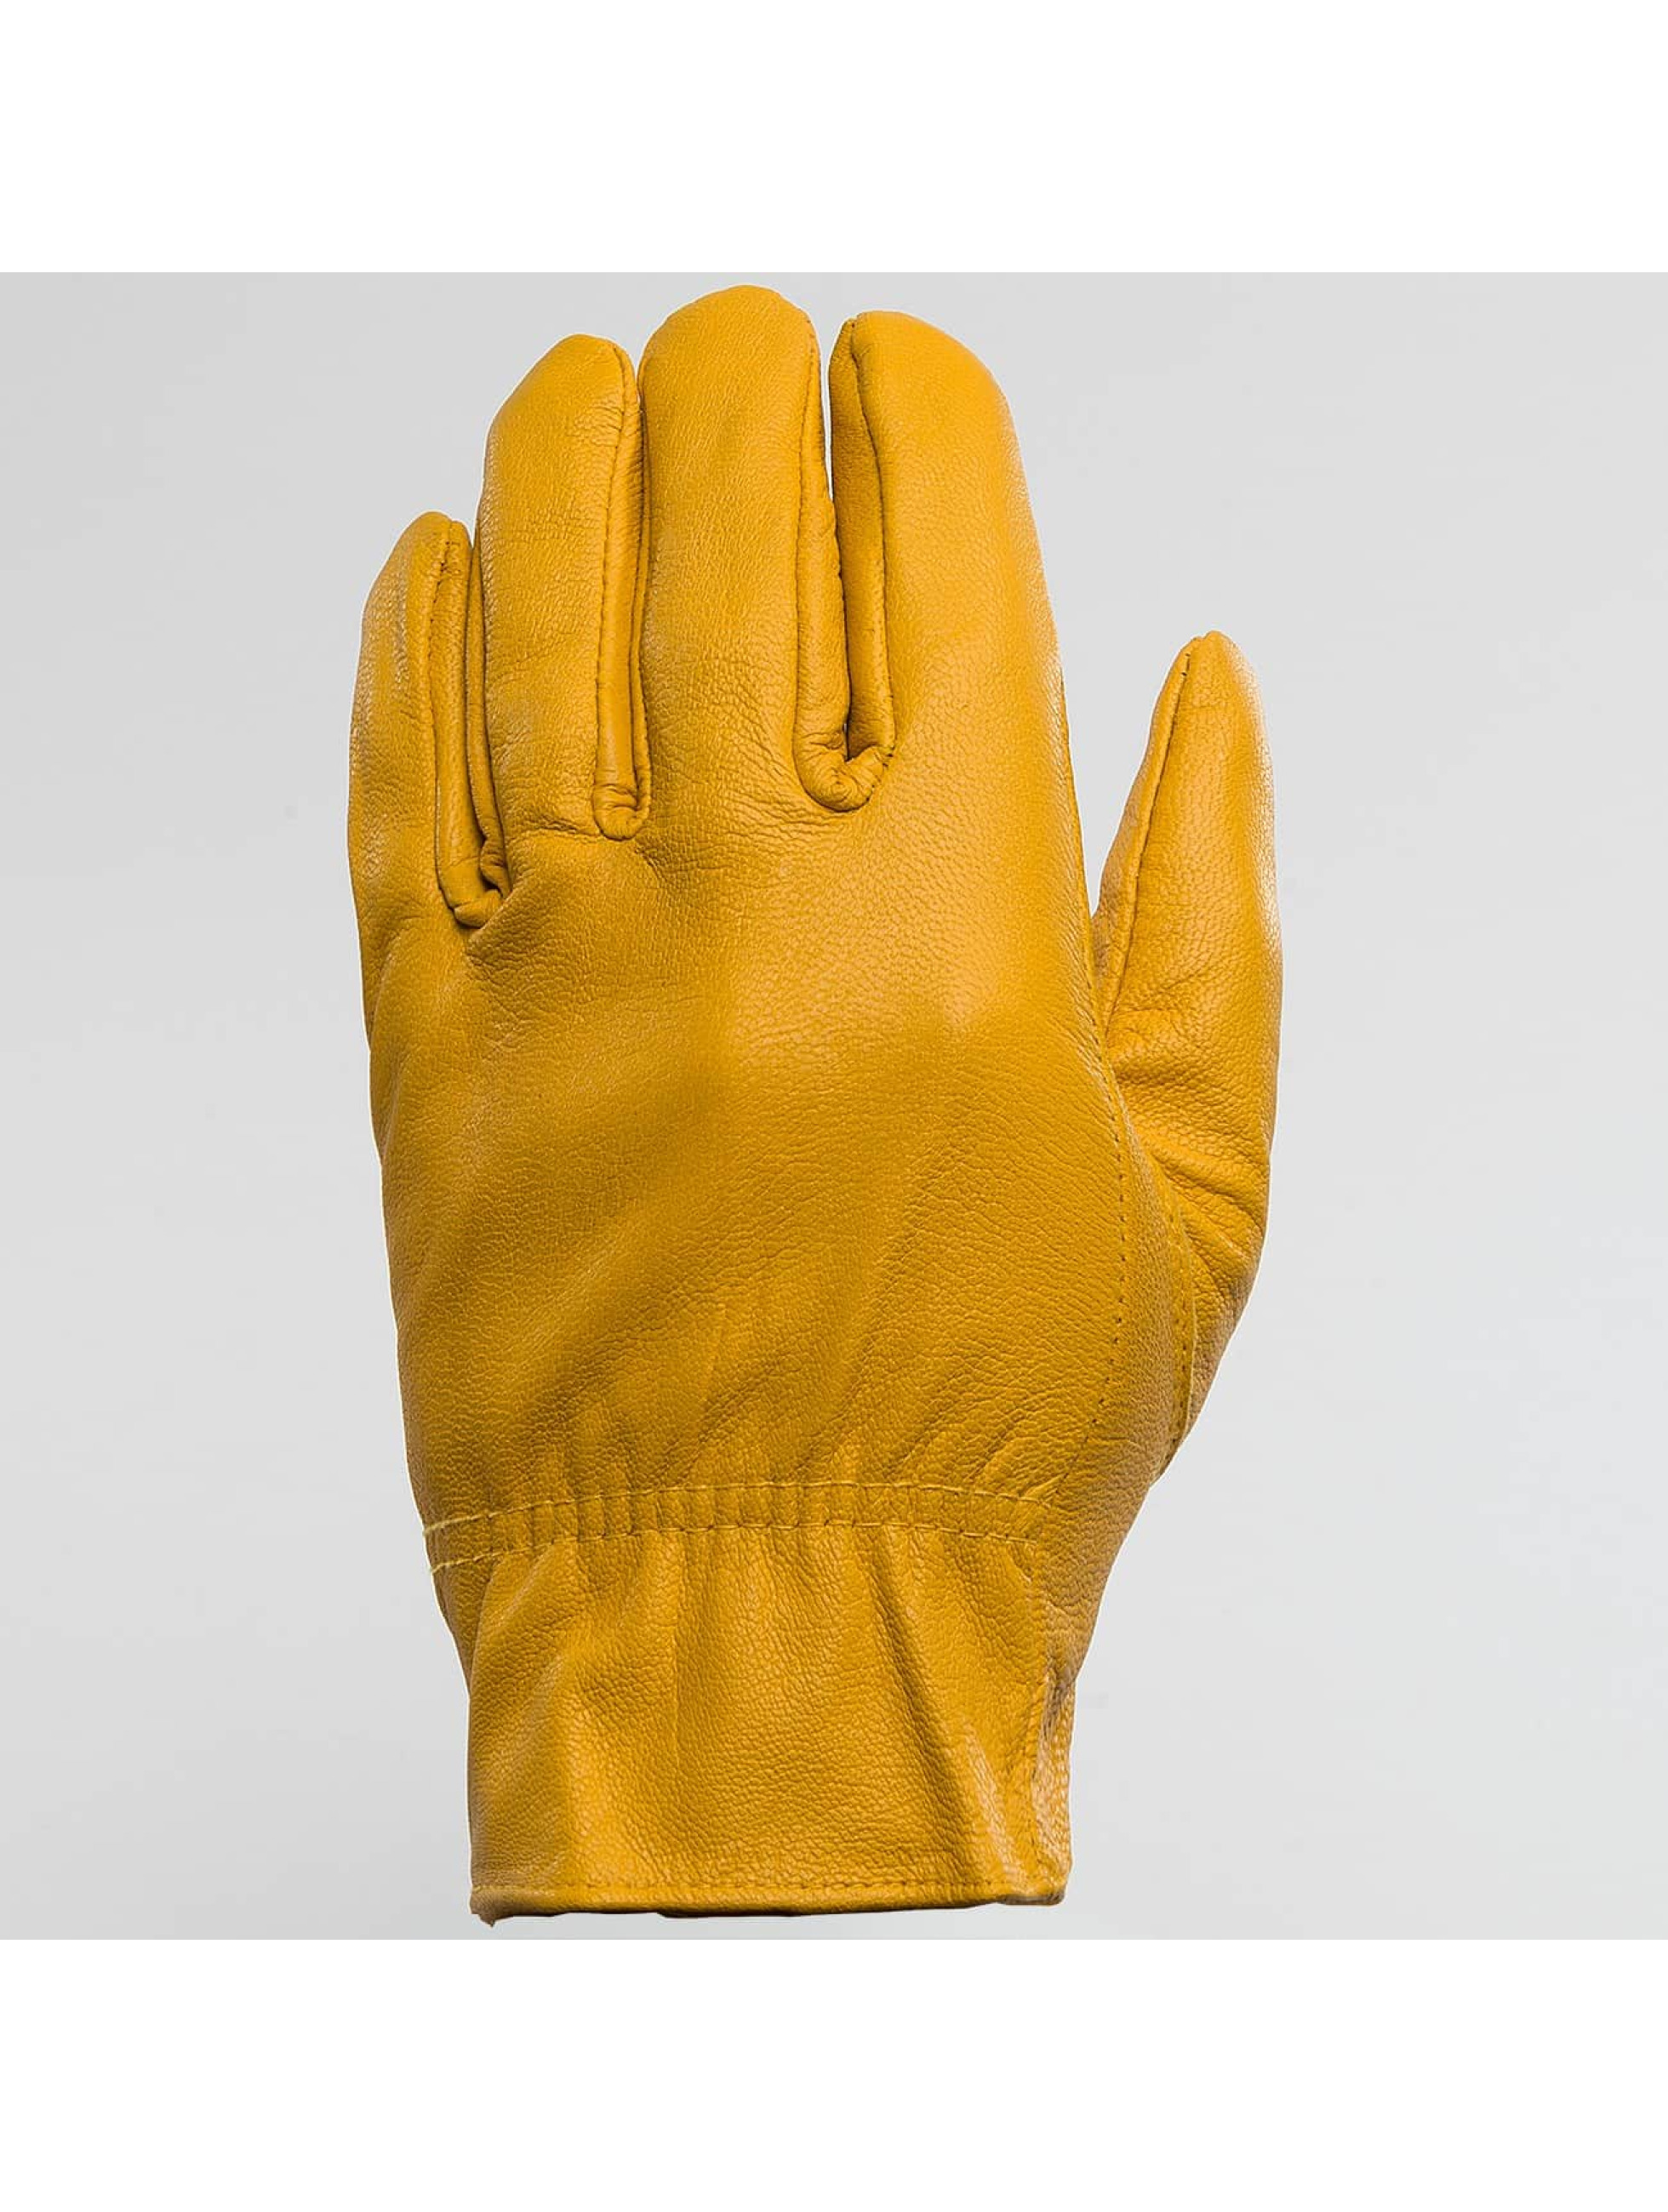 Dickies Gants Lined Leather jaune